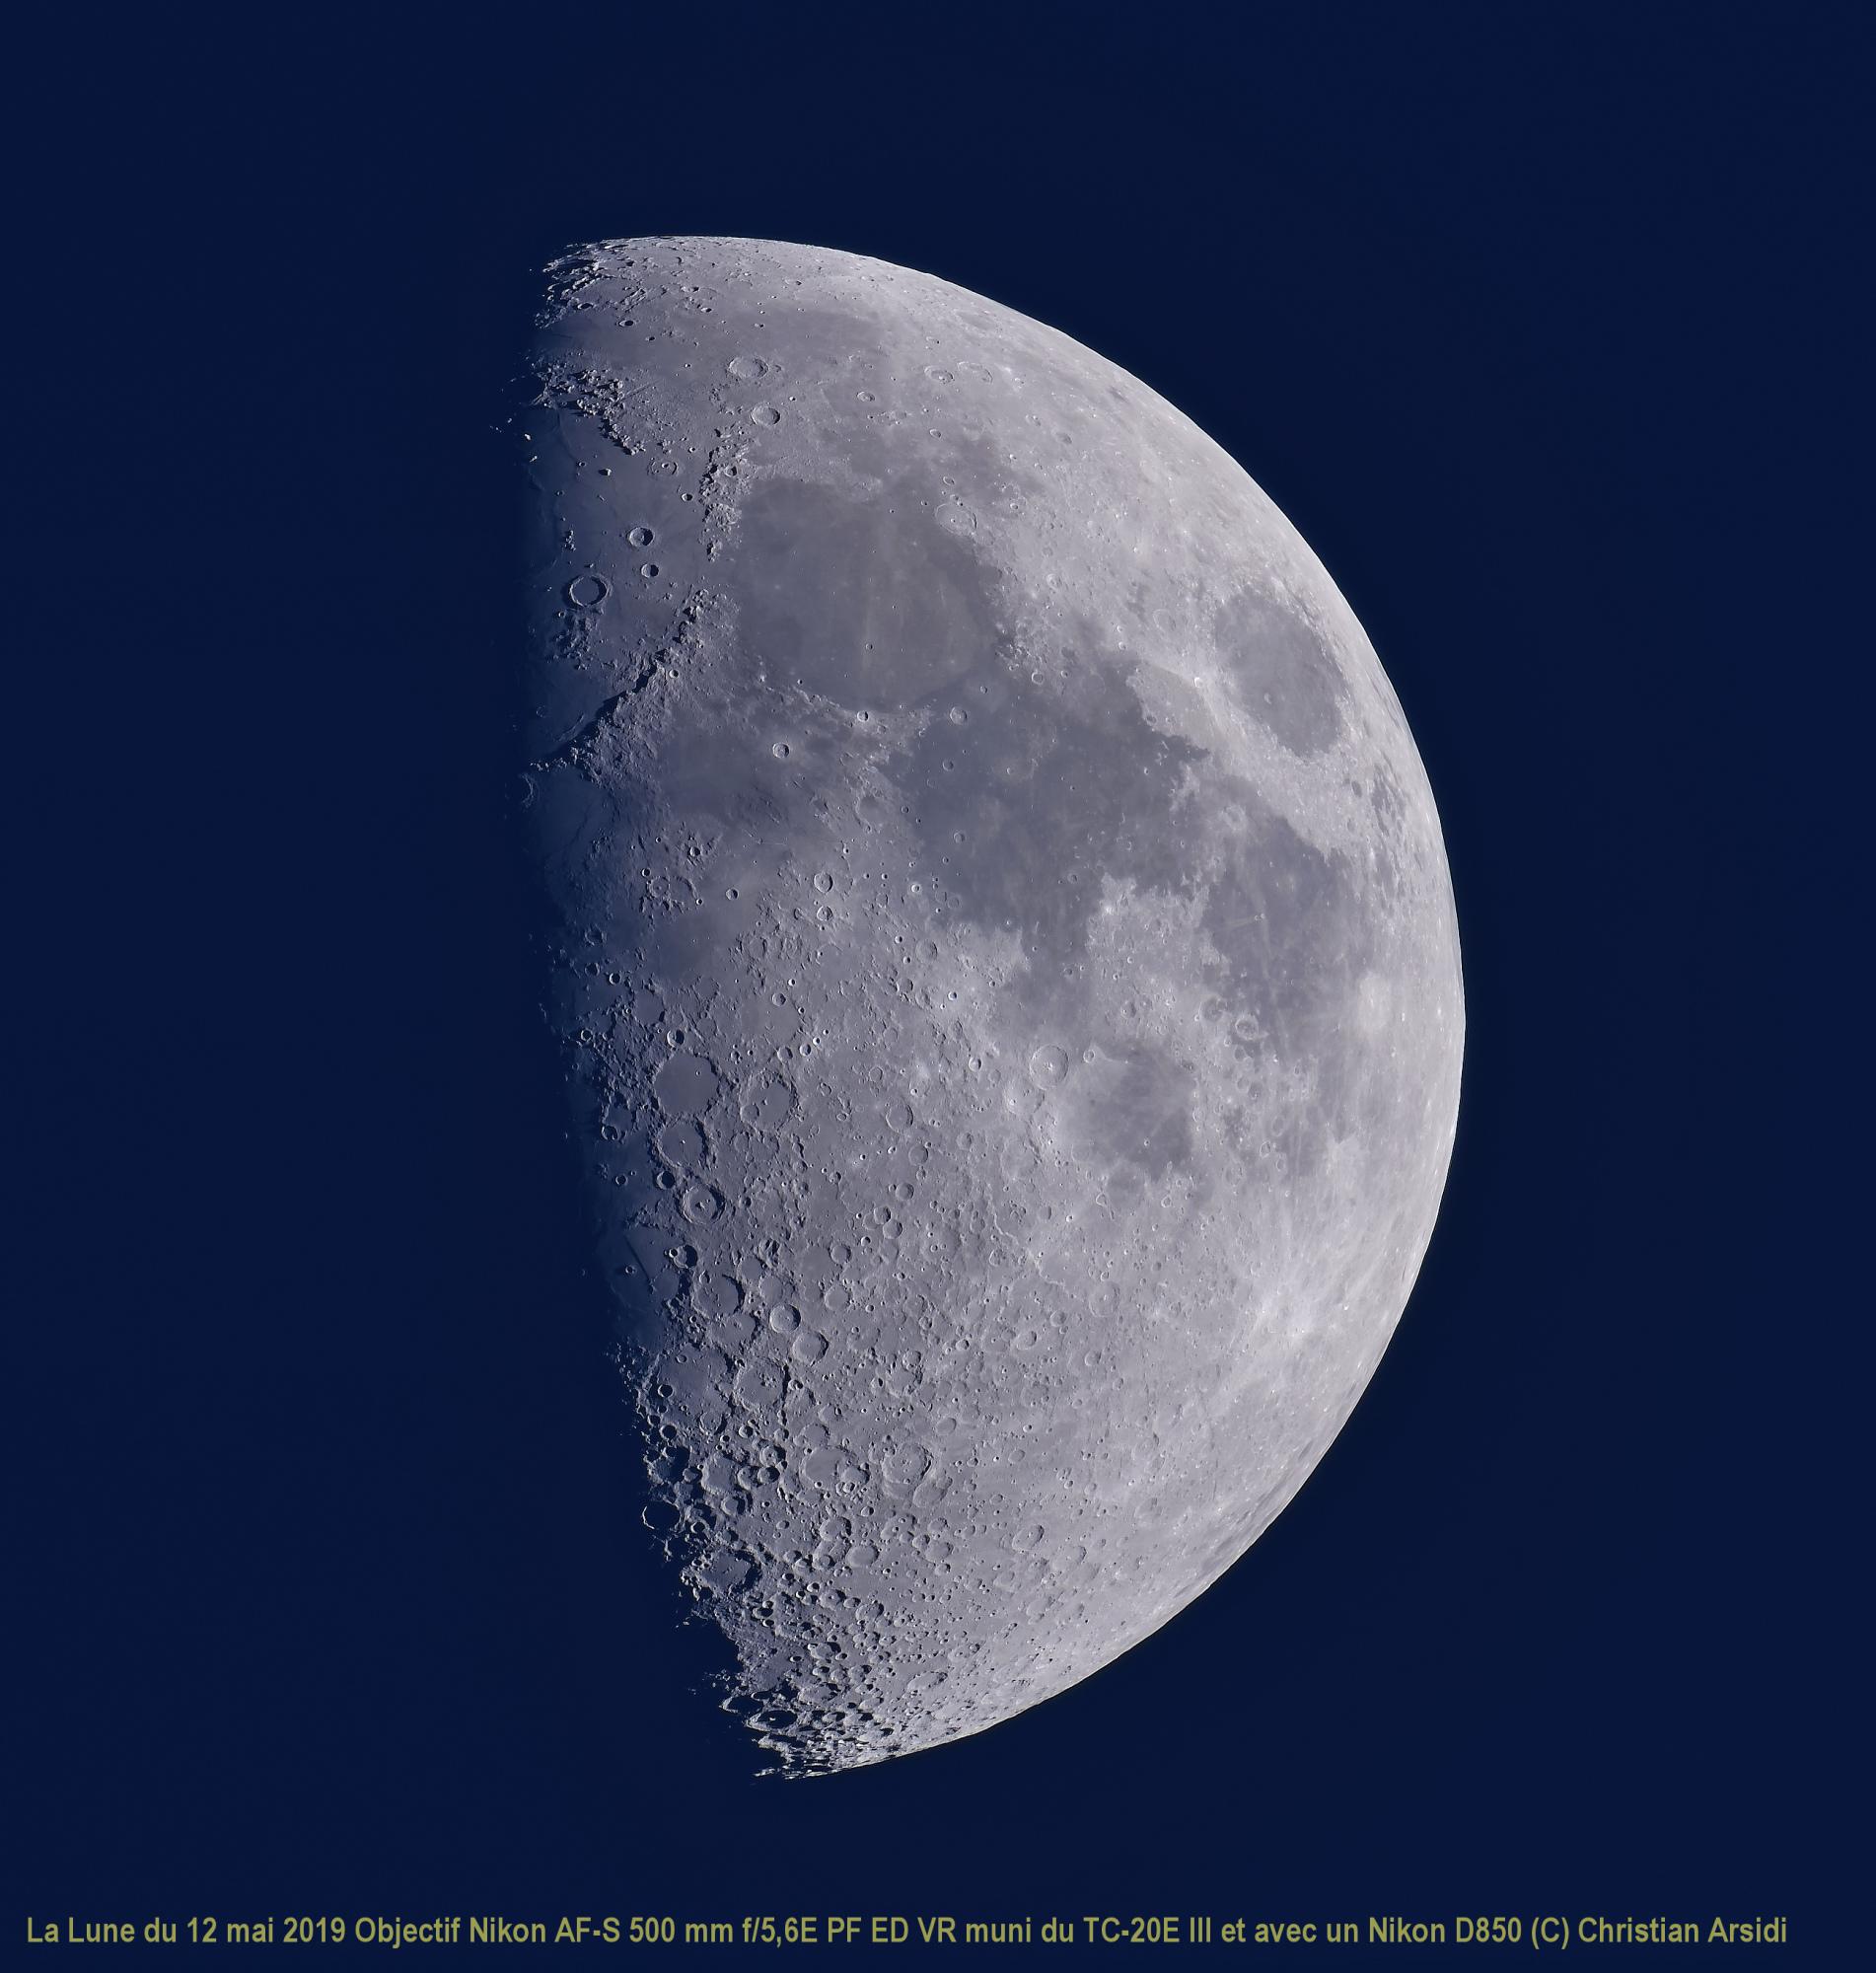 La Lune 40 images BV CA TTB  JPEG. 100%.jpg